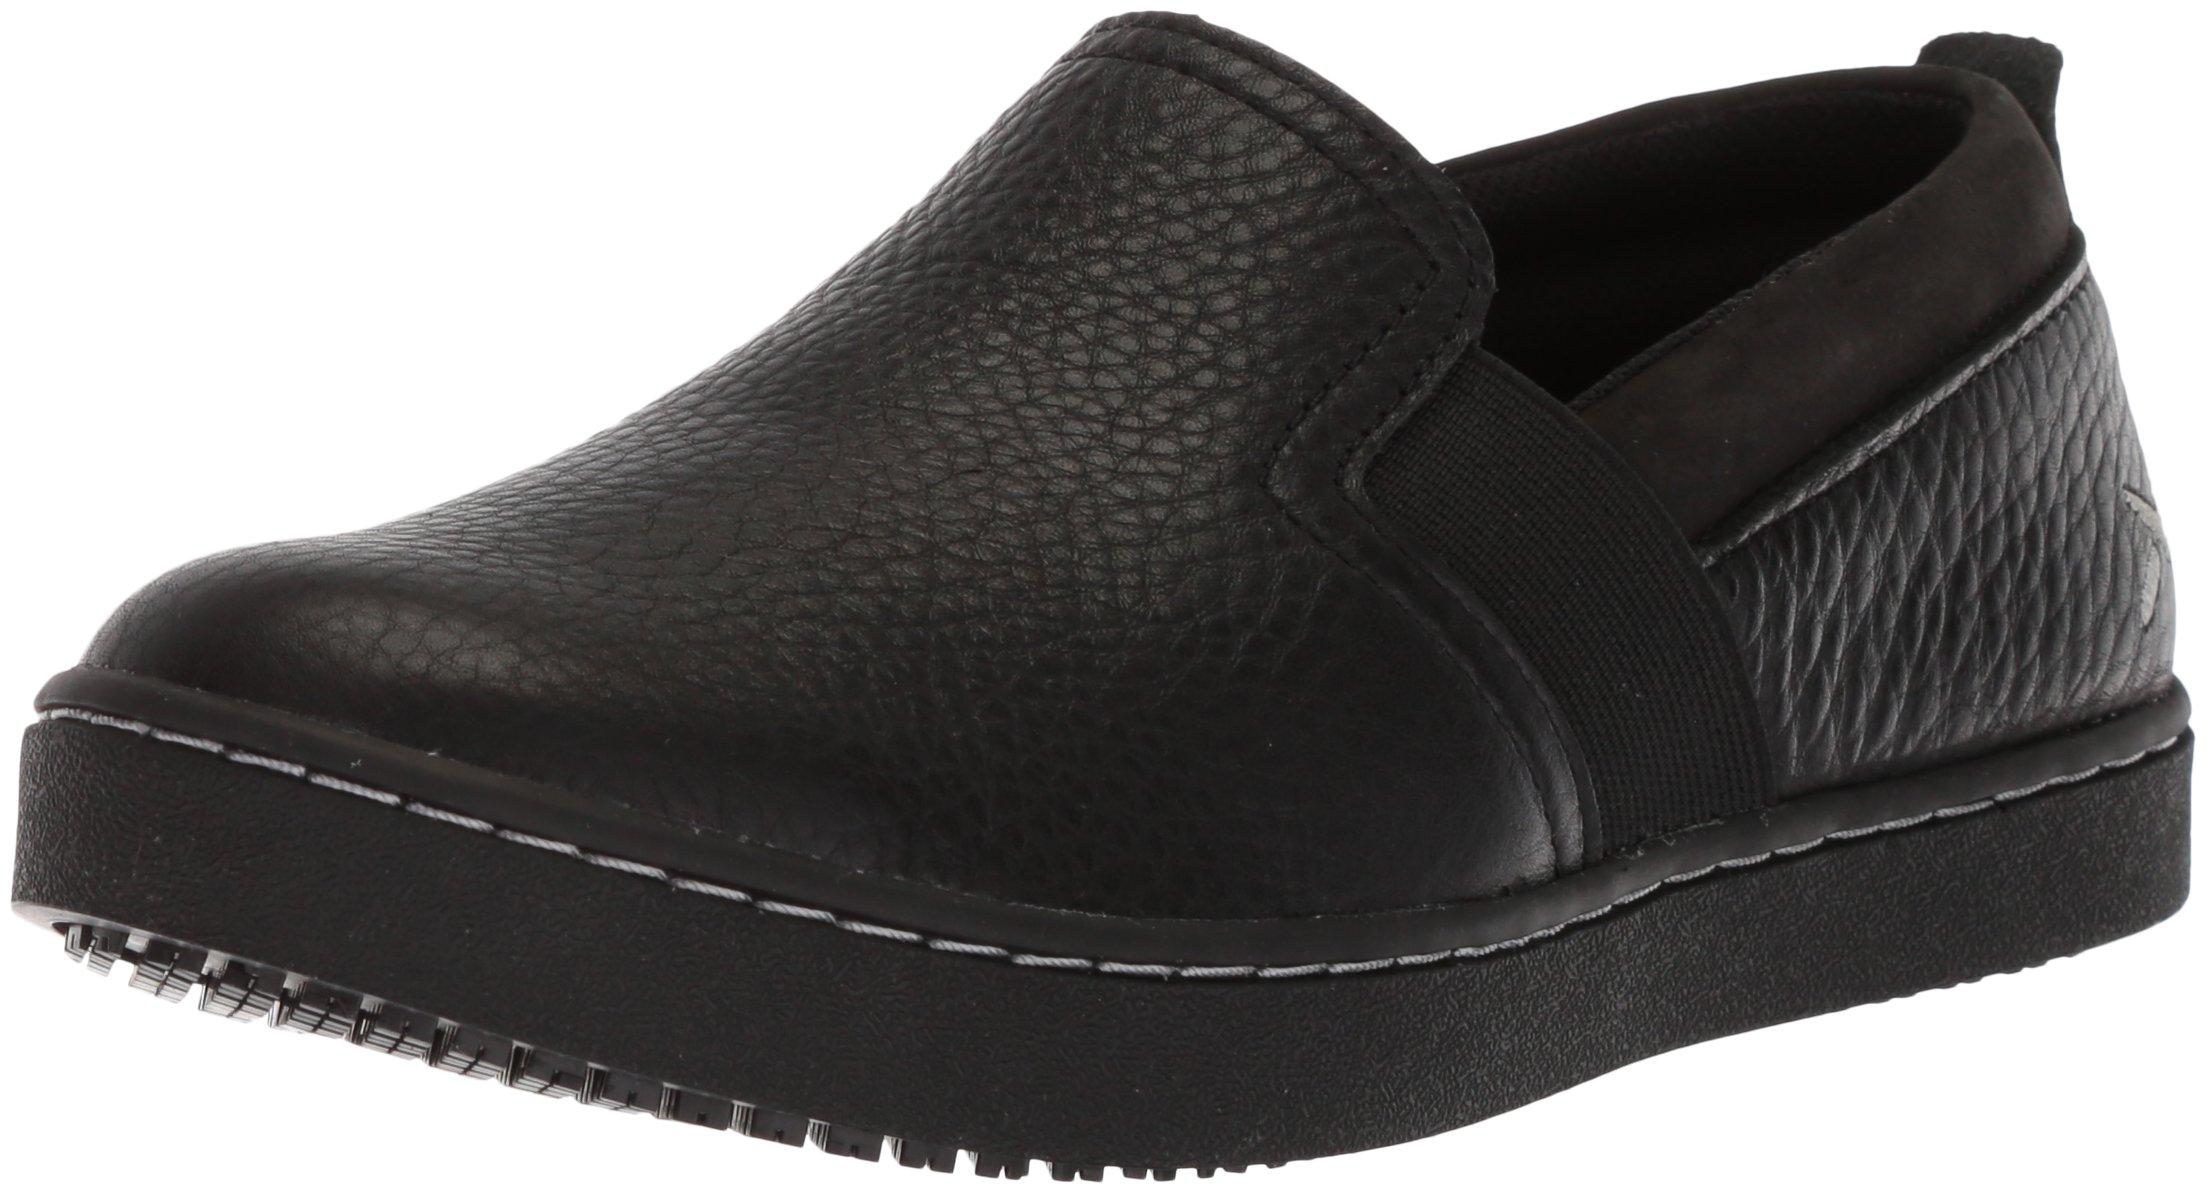 MOZO Women's Kai Food Service Shoe, Black, 5.5 Medium US